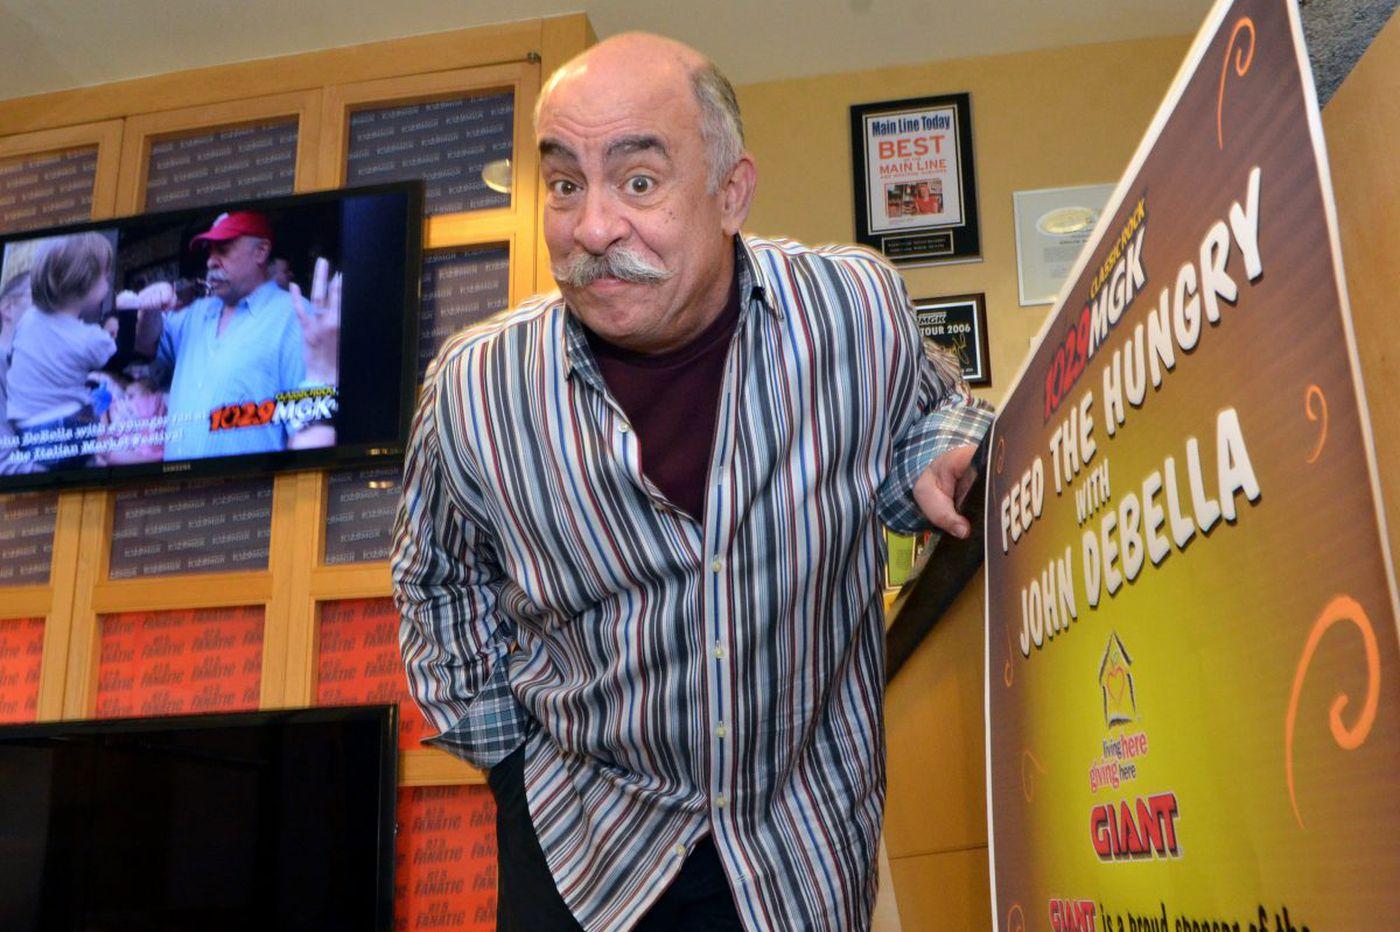 Lawsuit accuses 102.9 WMGK radio host John DeBella of sexual harassment